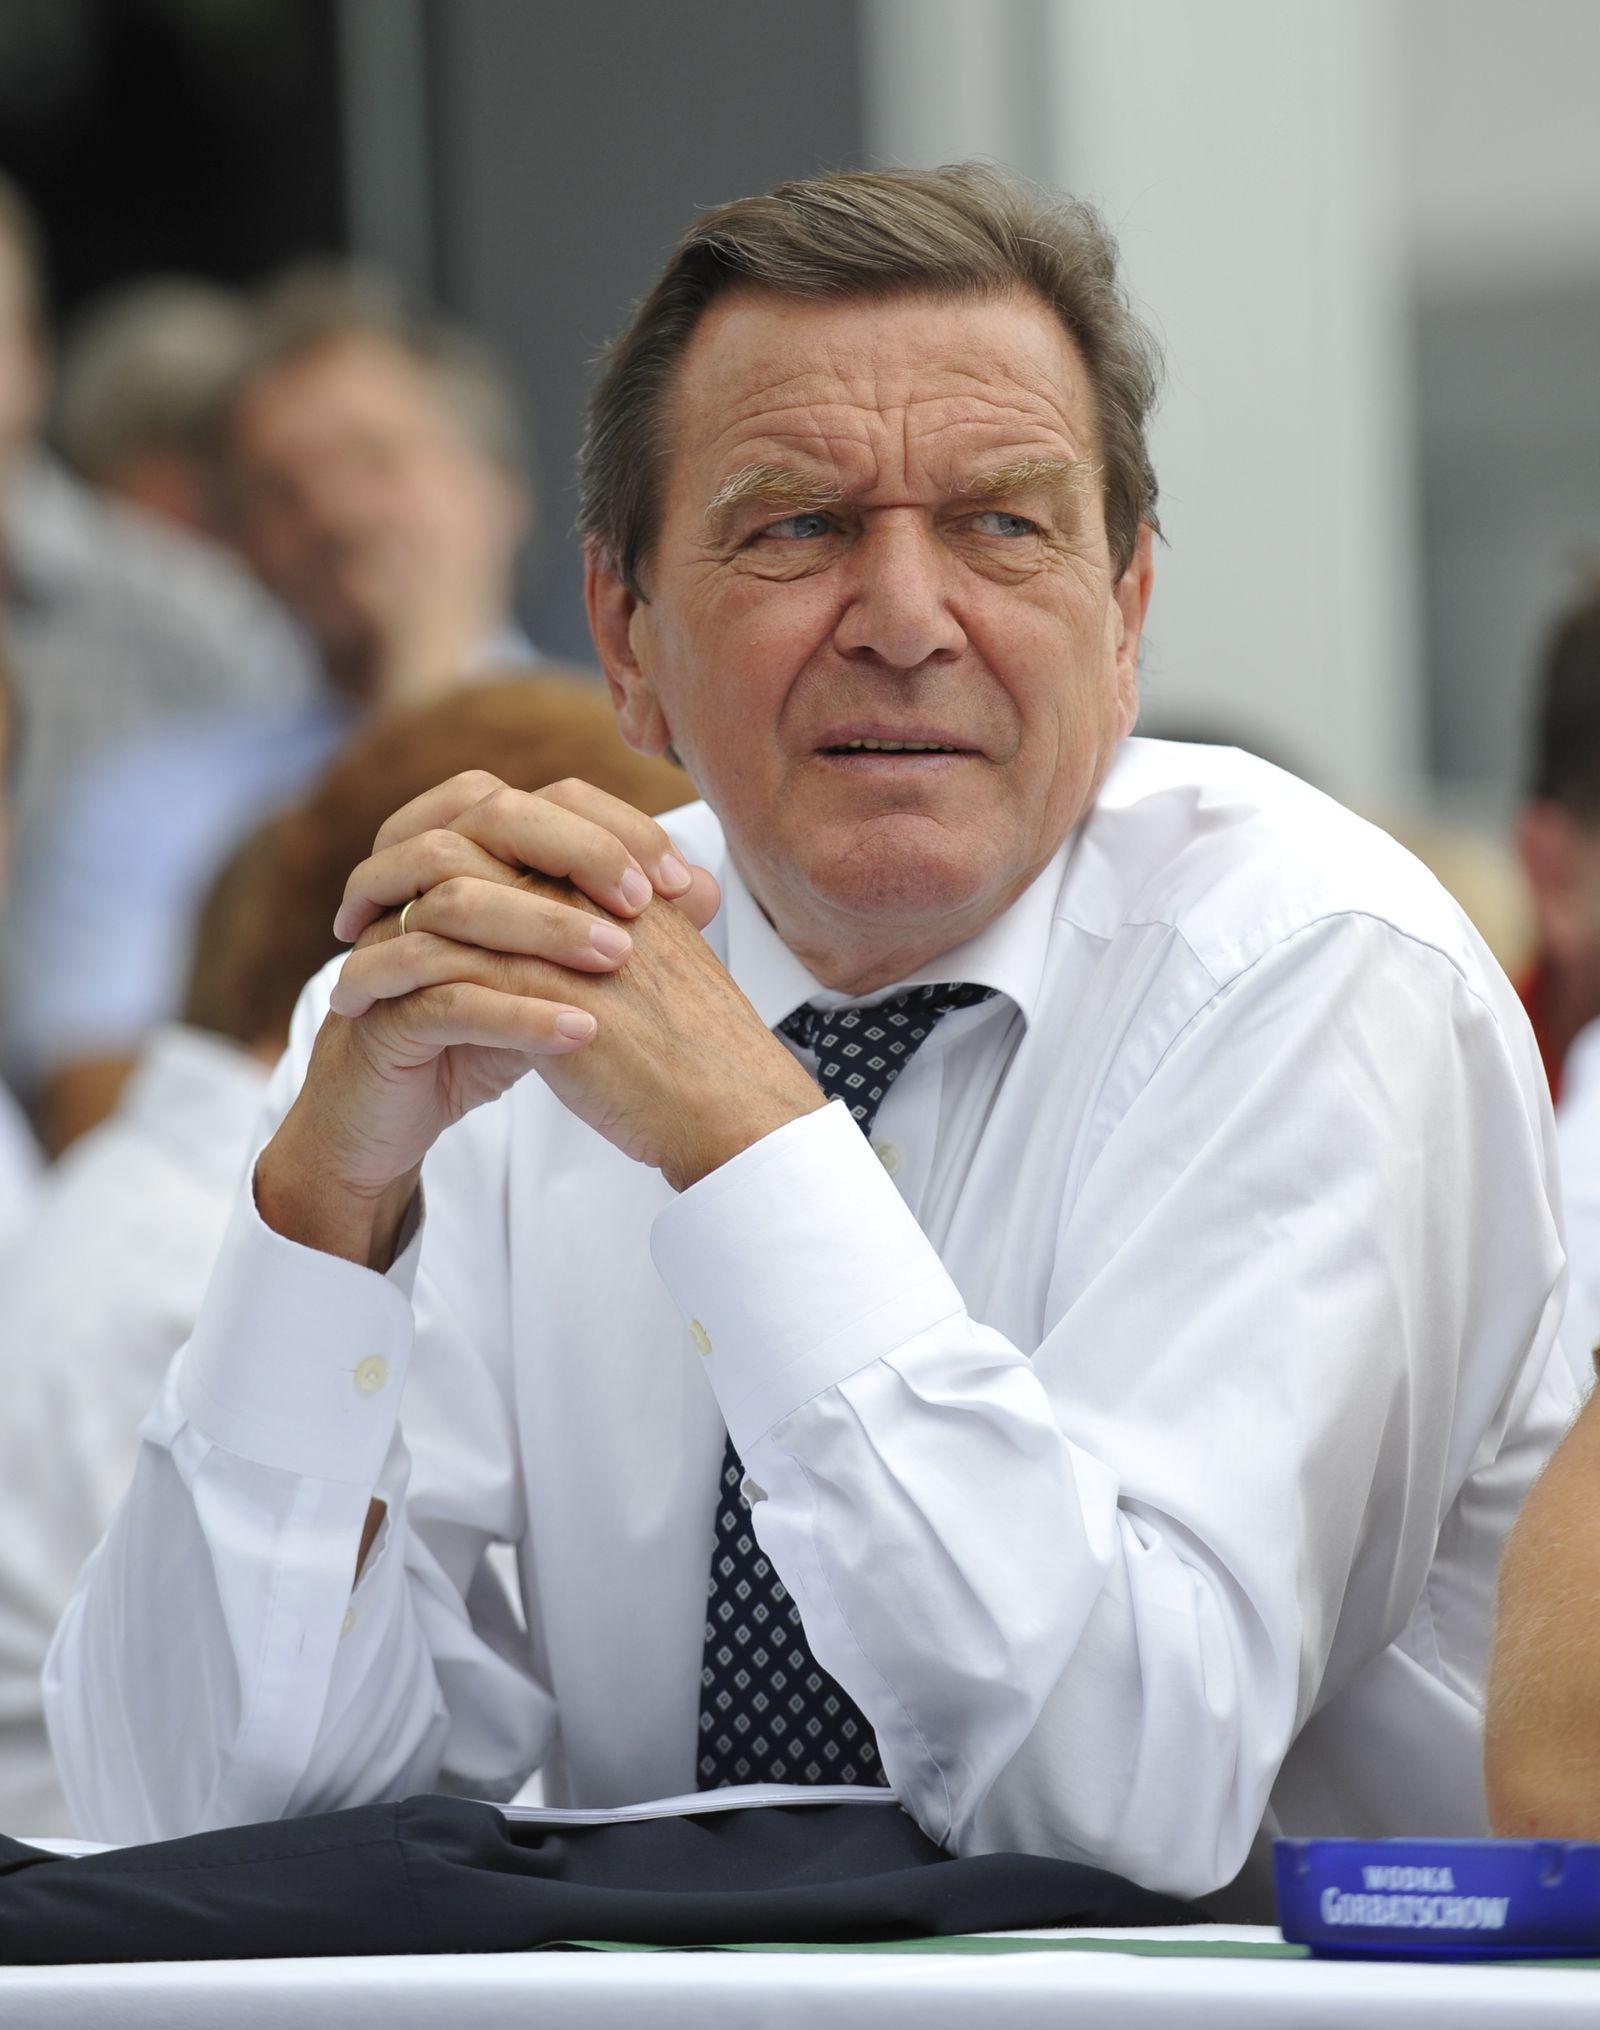 Gerhard Schröder Lommatzsch